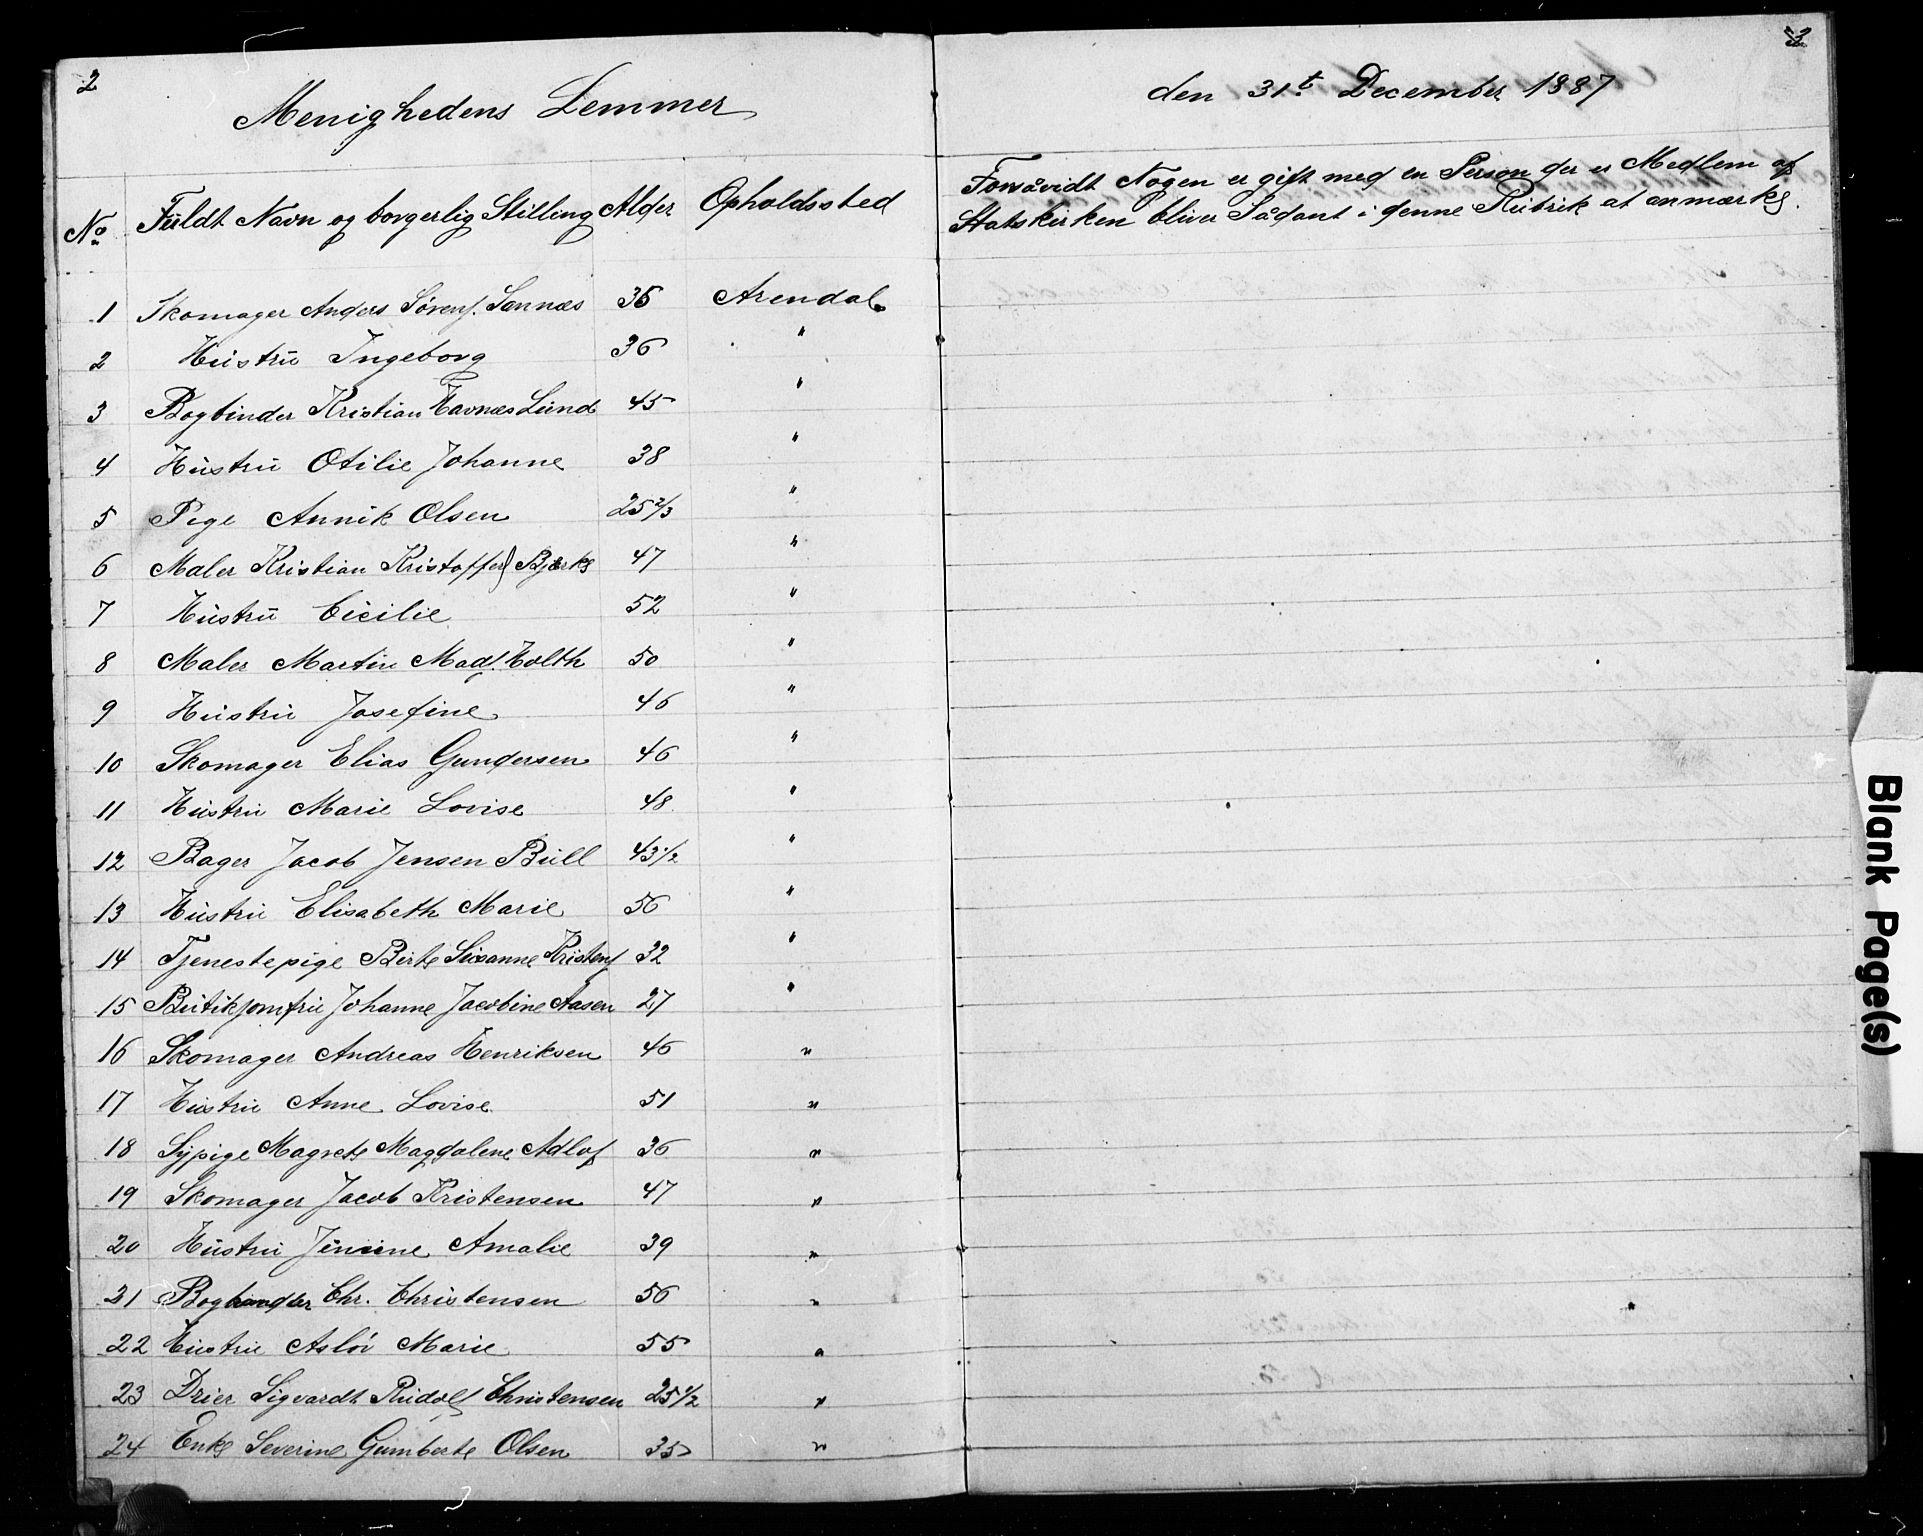 SAK, Den evangelisk-lutherske frimenighet, Arendal, F/Fa/L0003: Dissenterprotokoll nr. F 7, 1887-1887, s. 2-3